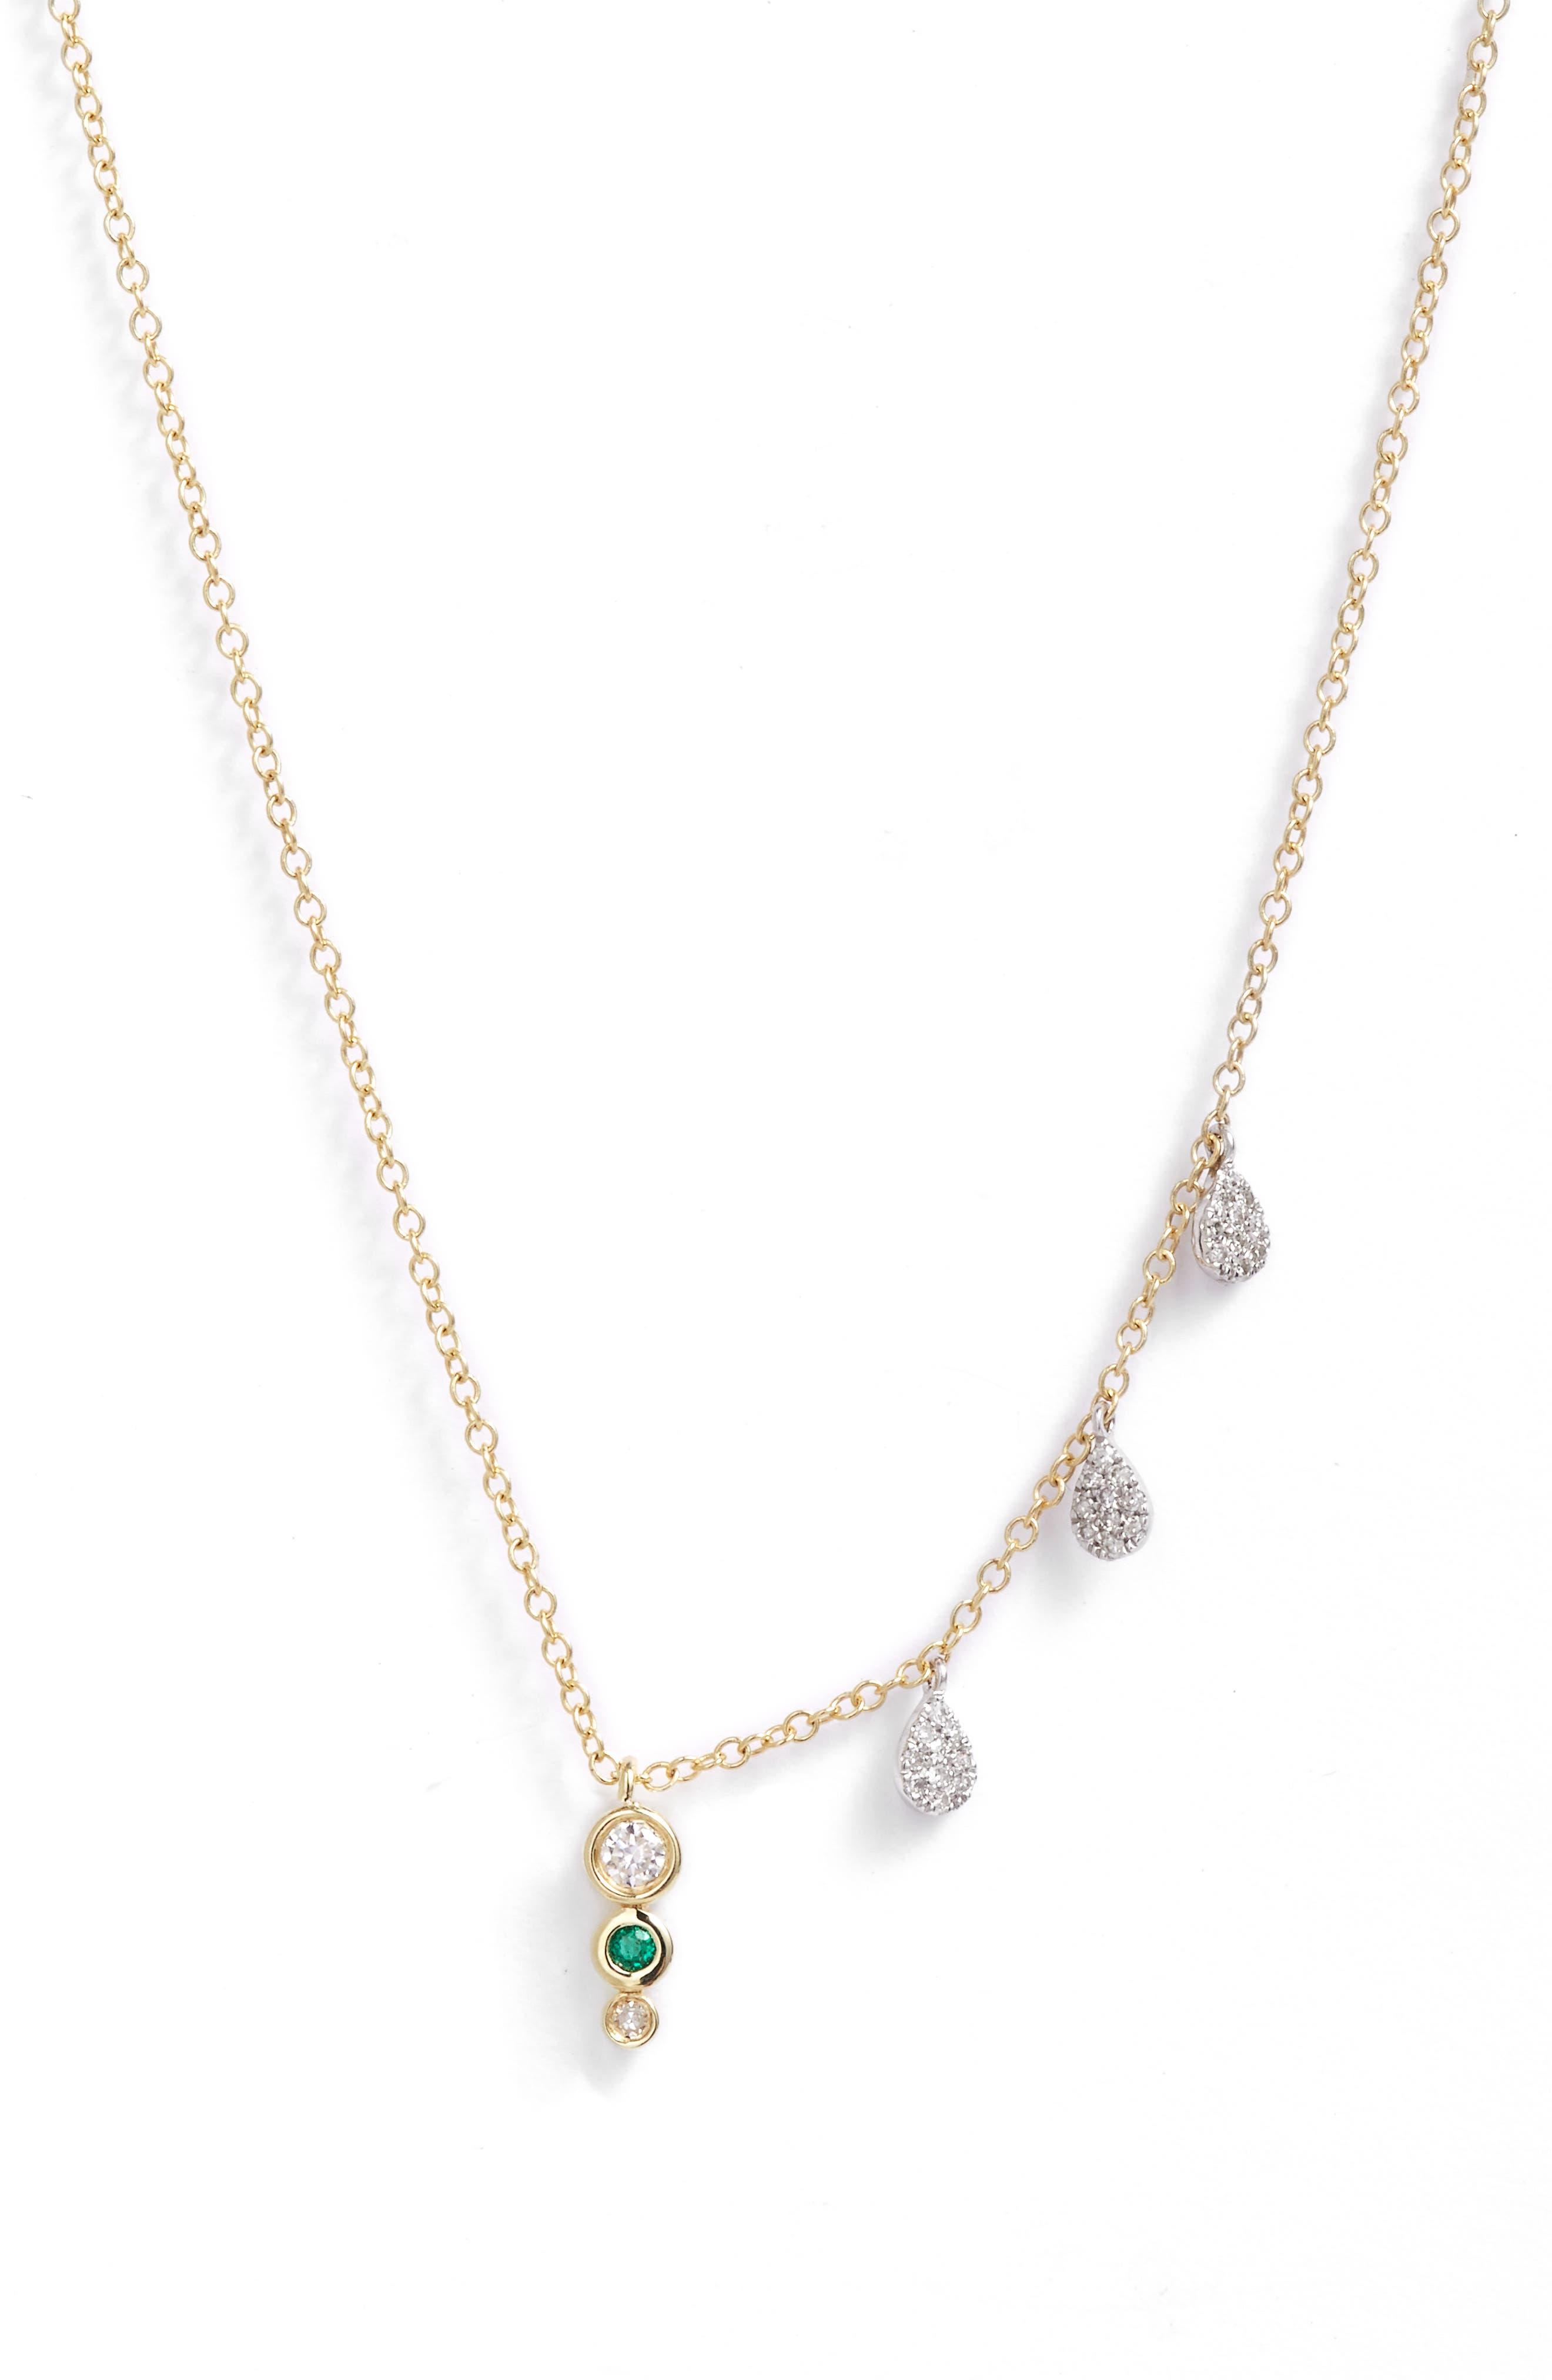 Diamond & Emerald Multi Charm Pendant Necklace